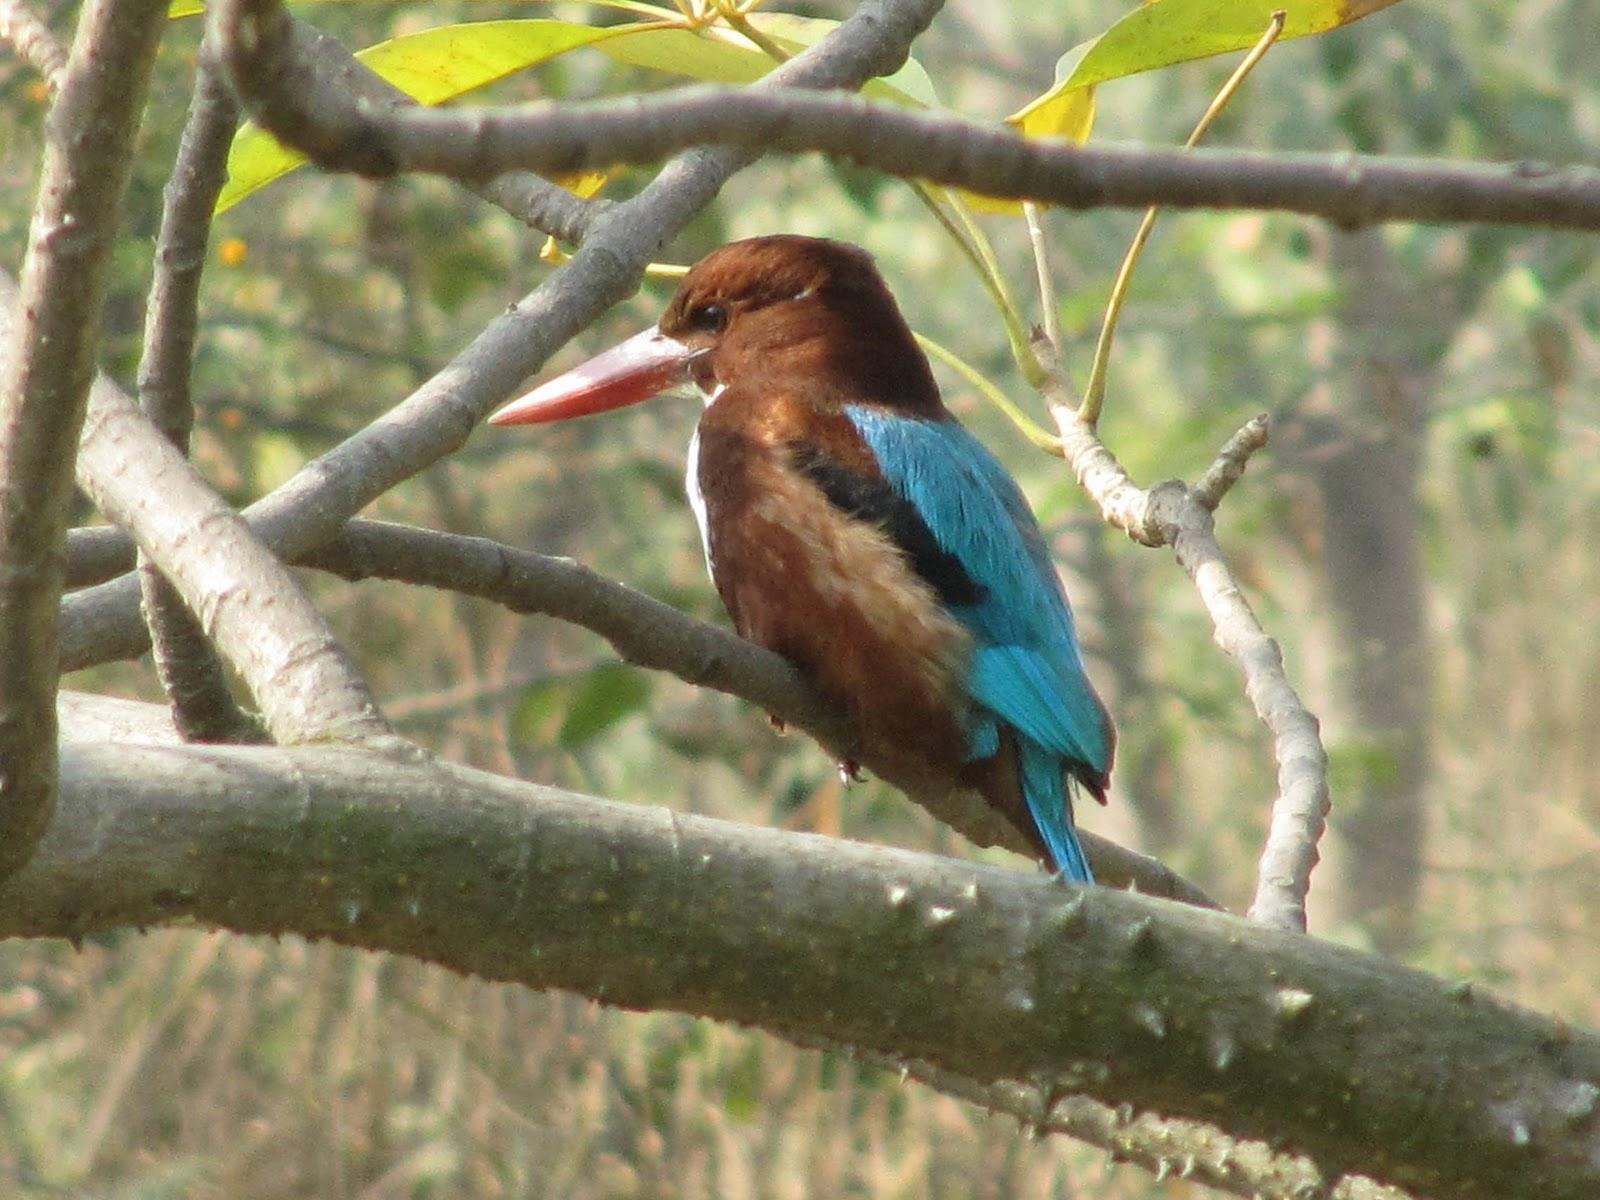 yamuna Biodiversity Park GoBeyond